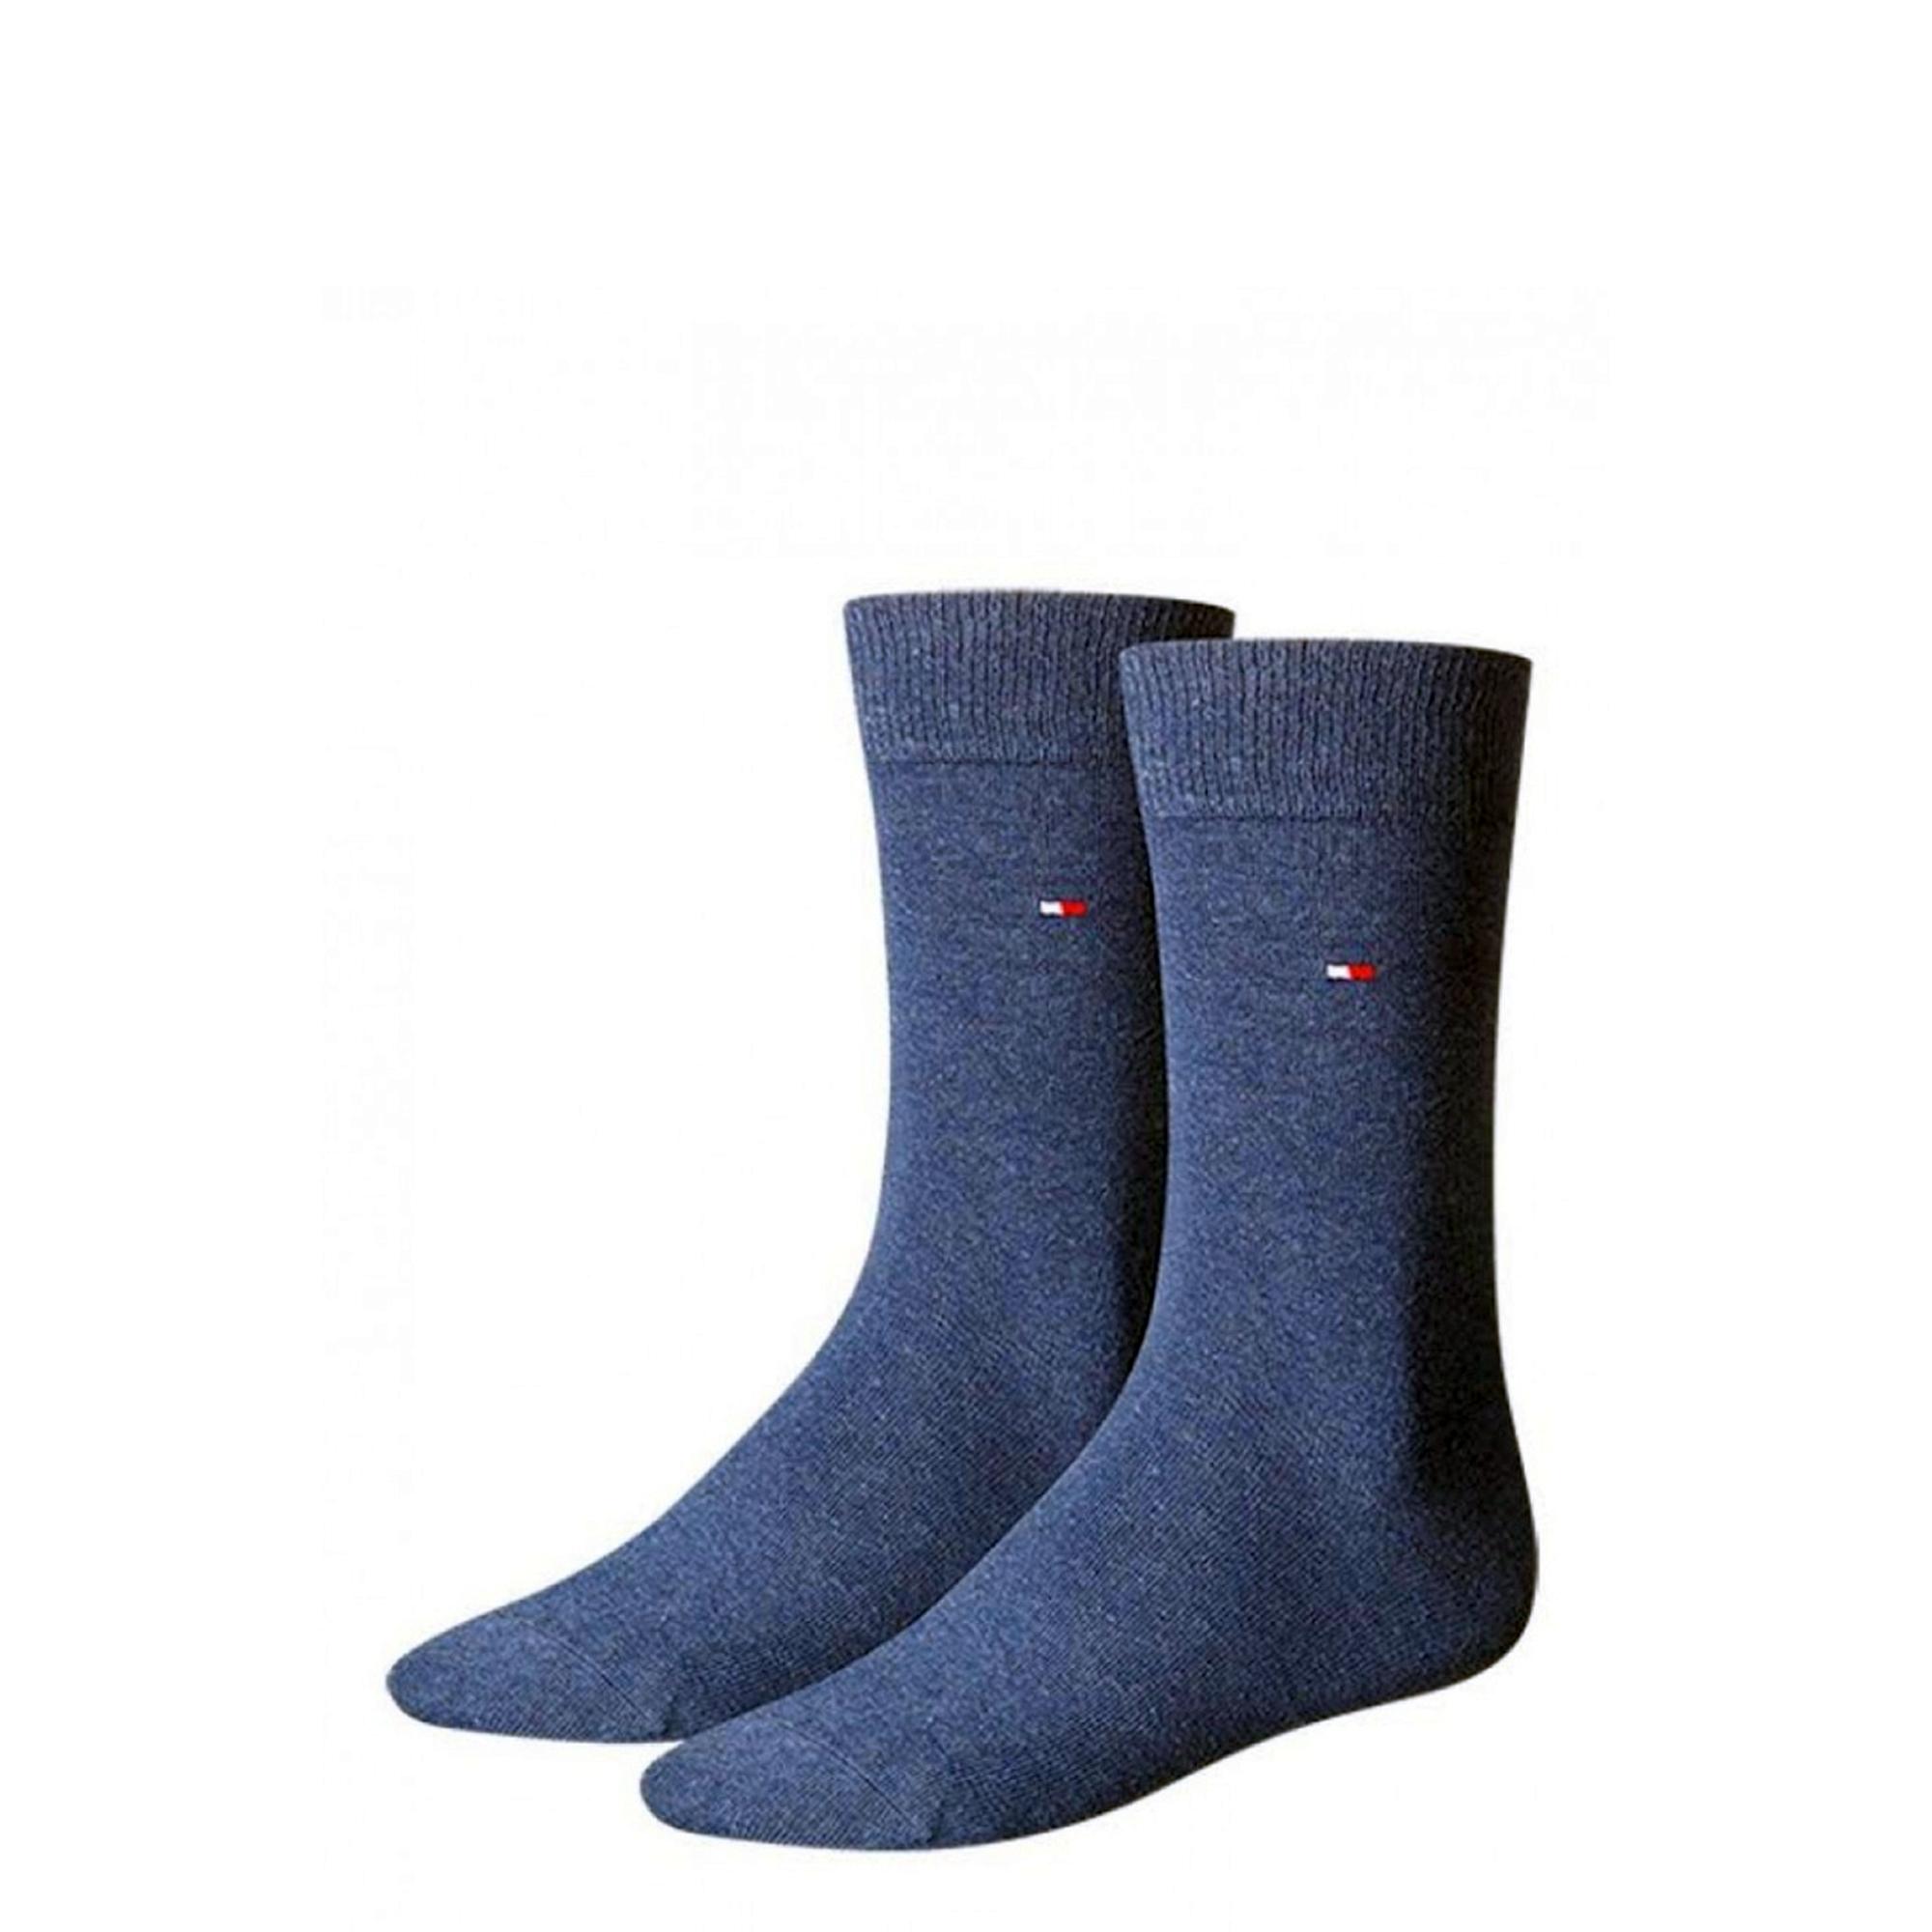 Tommy Hilfiger socks 371111 356 Jeans